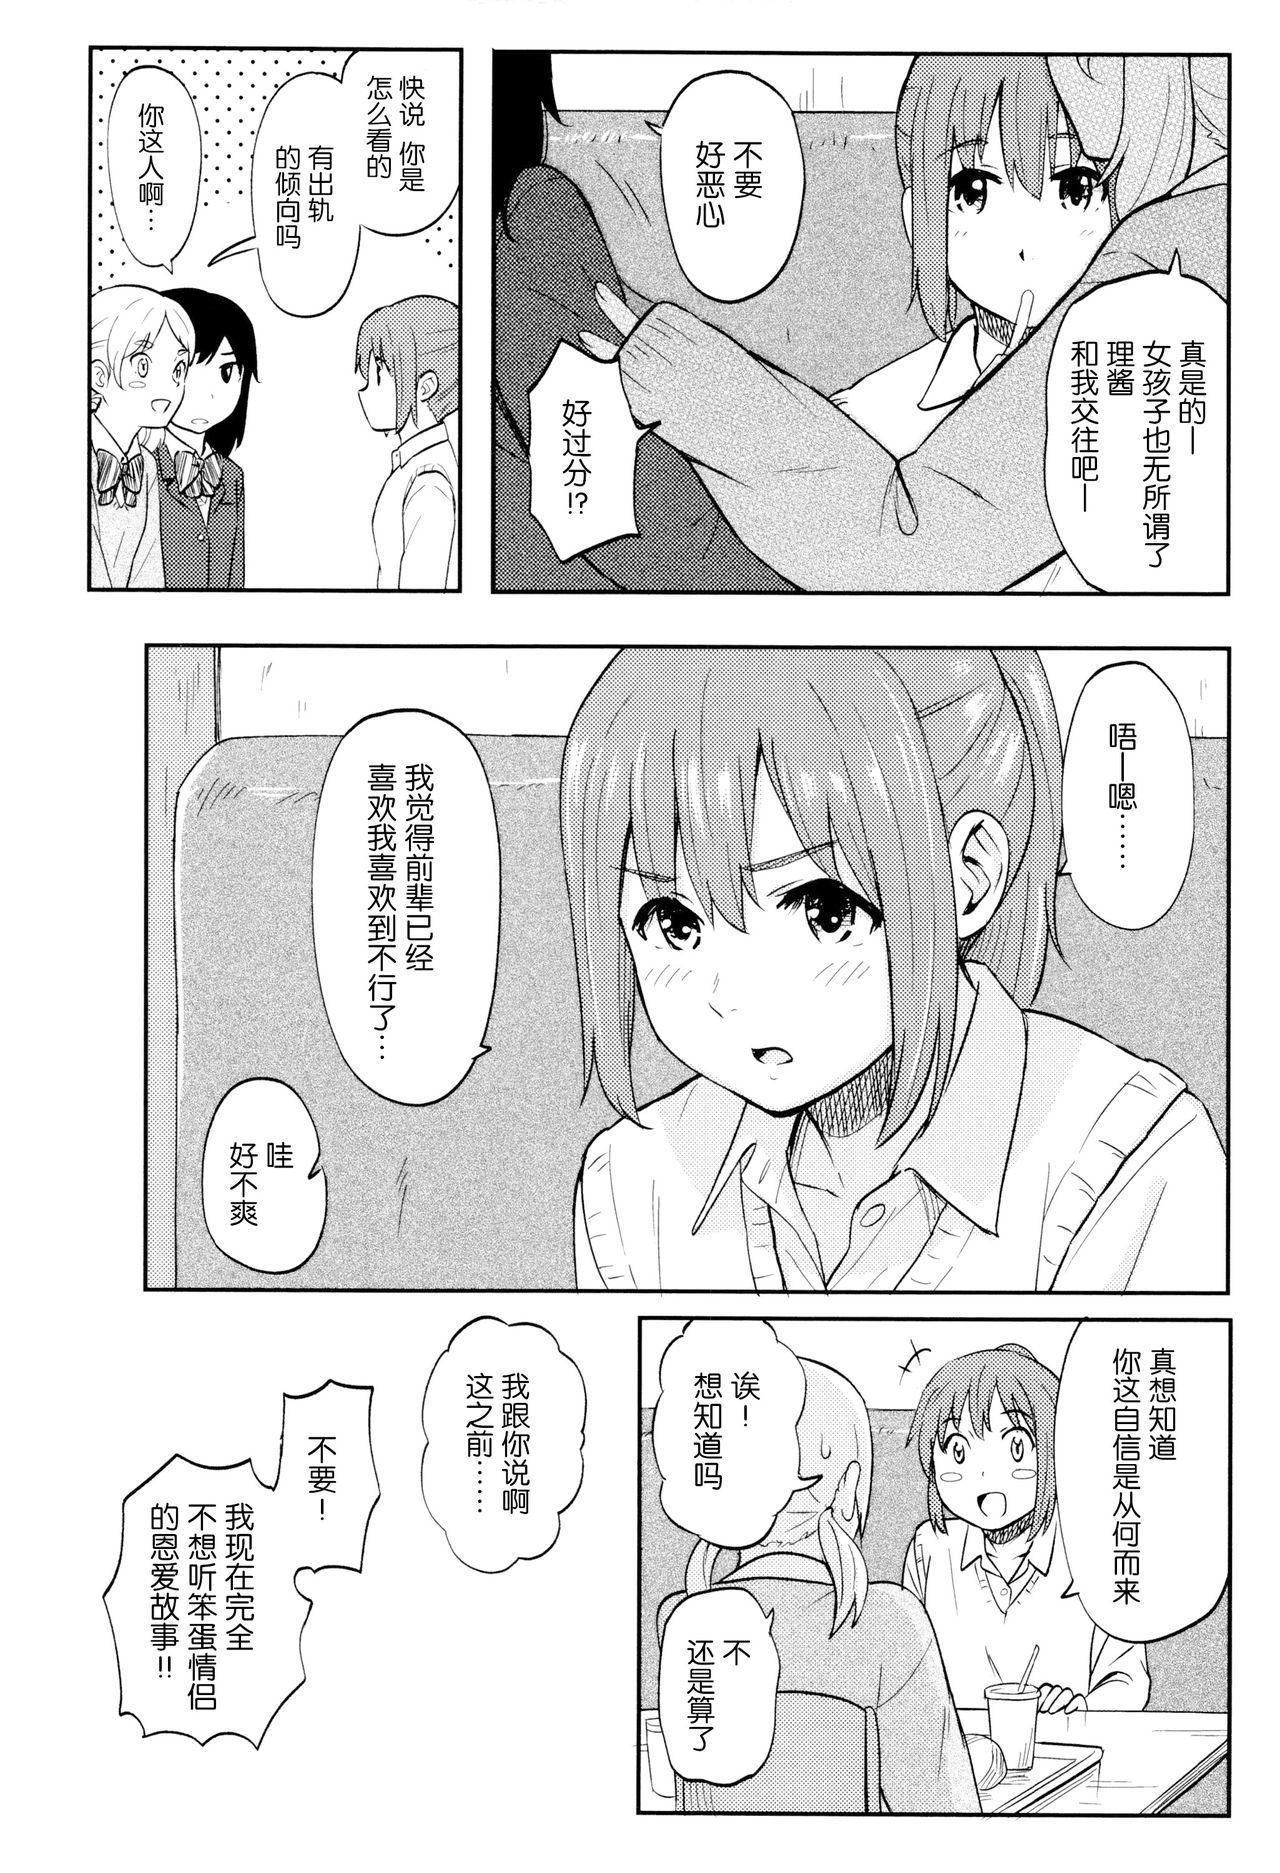 Tokubetsu na Mainichi - Special daily 168